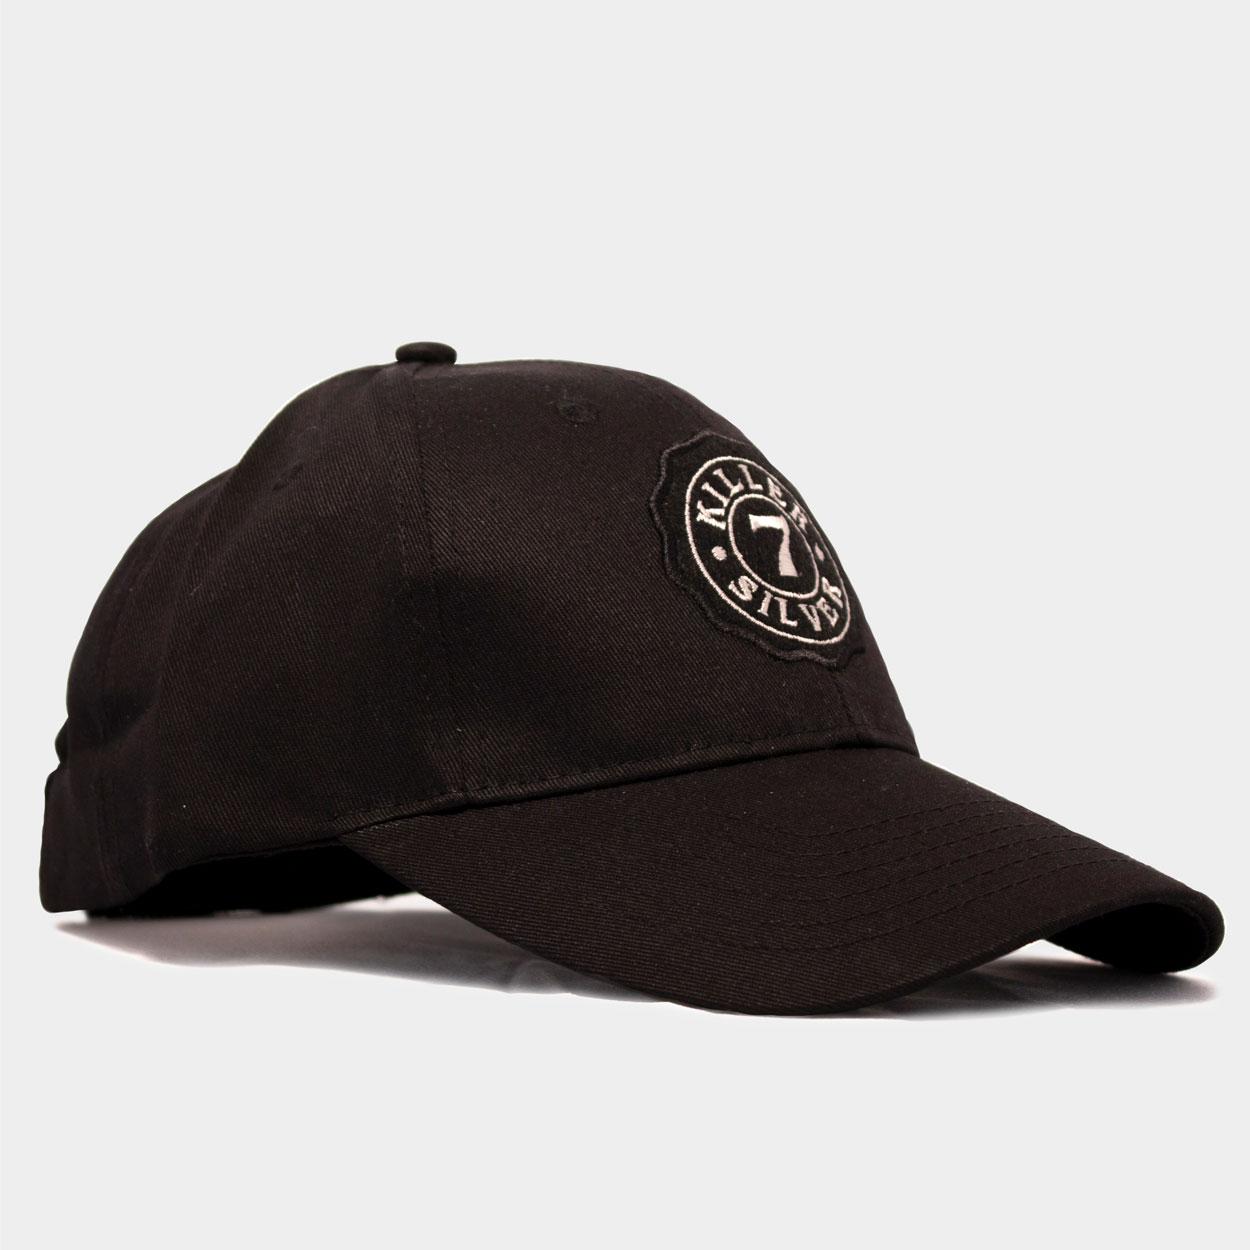 Baseball Hat-Curved Bill-Merchandise-KillerSilver